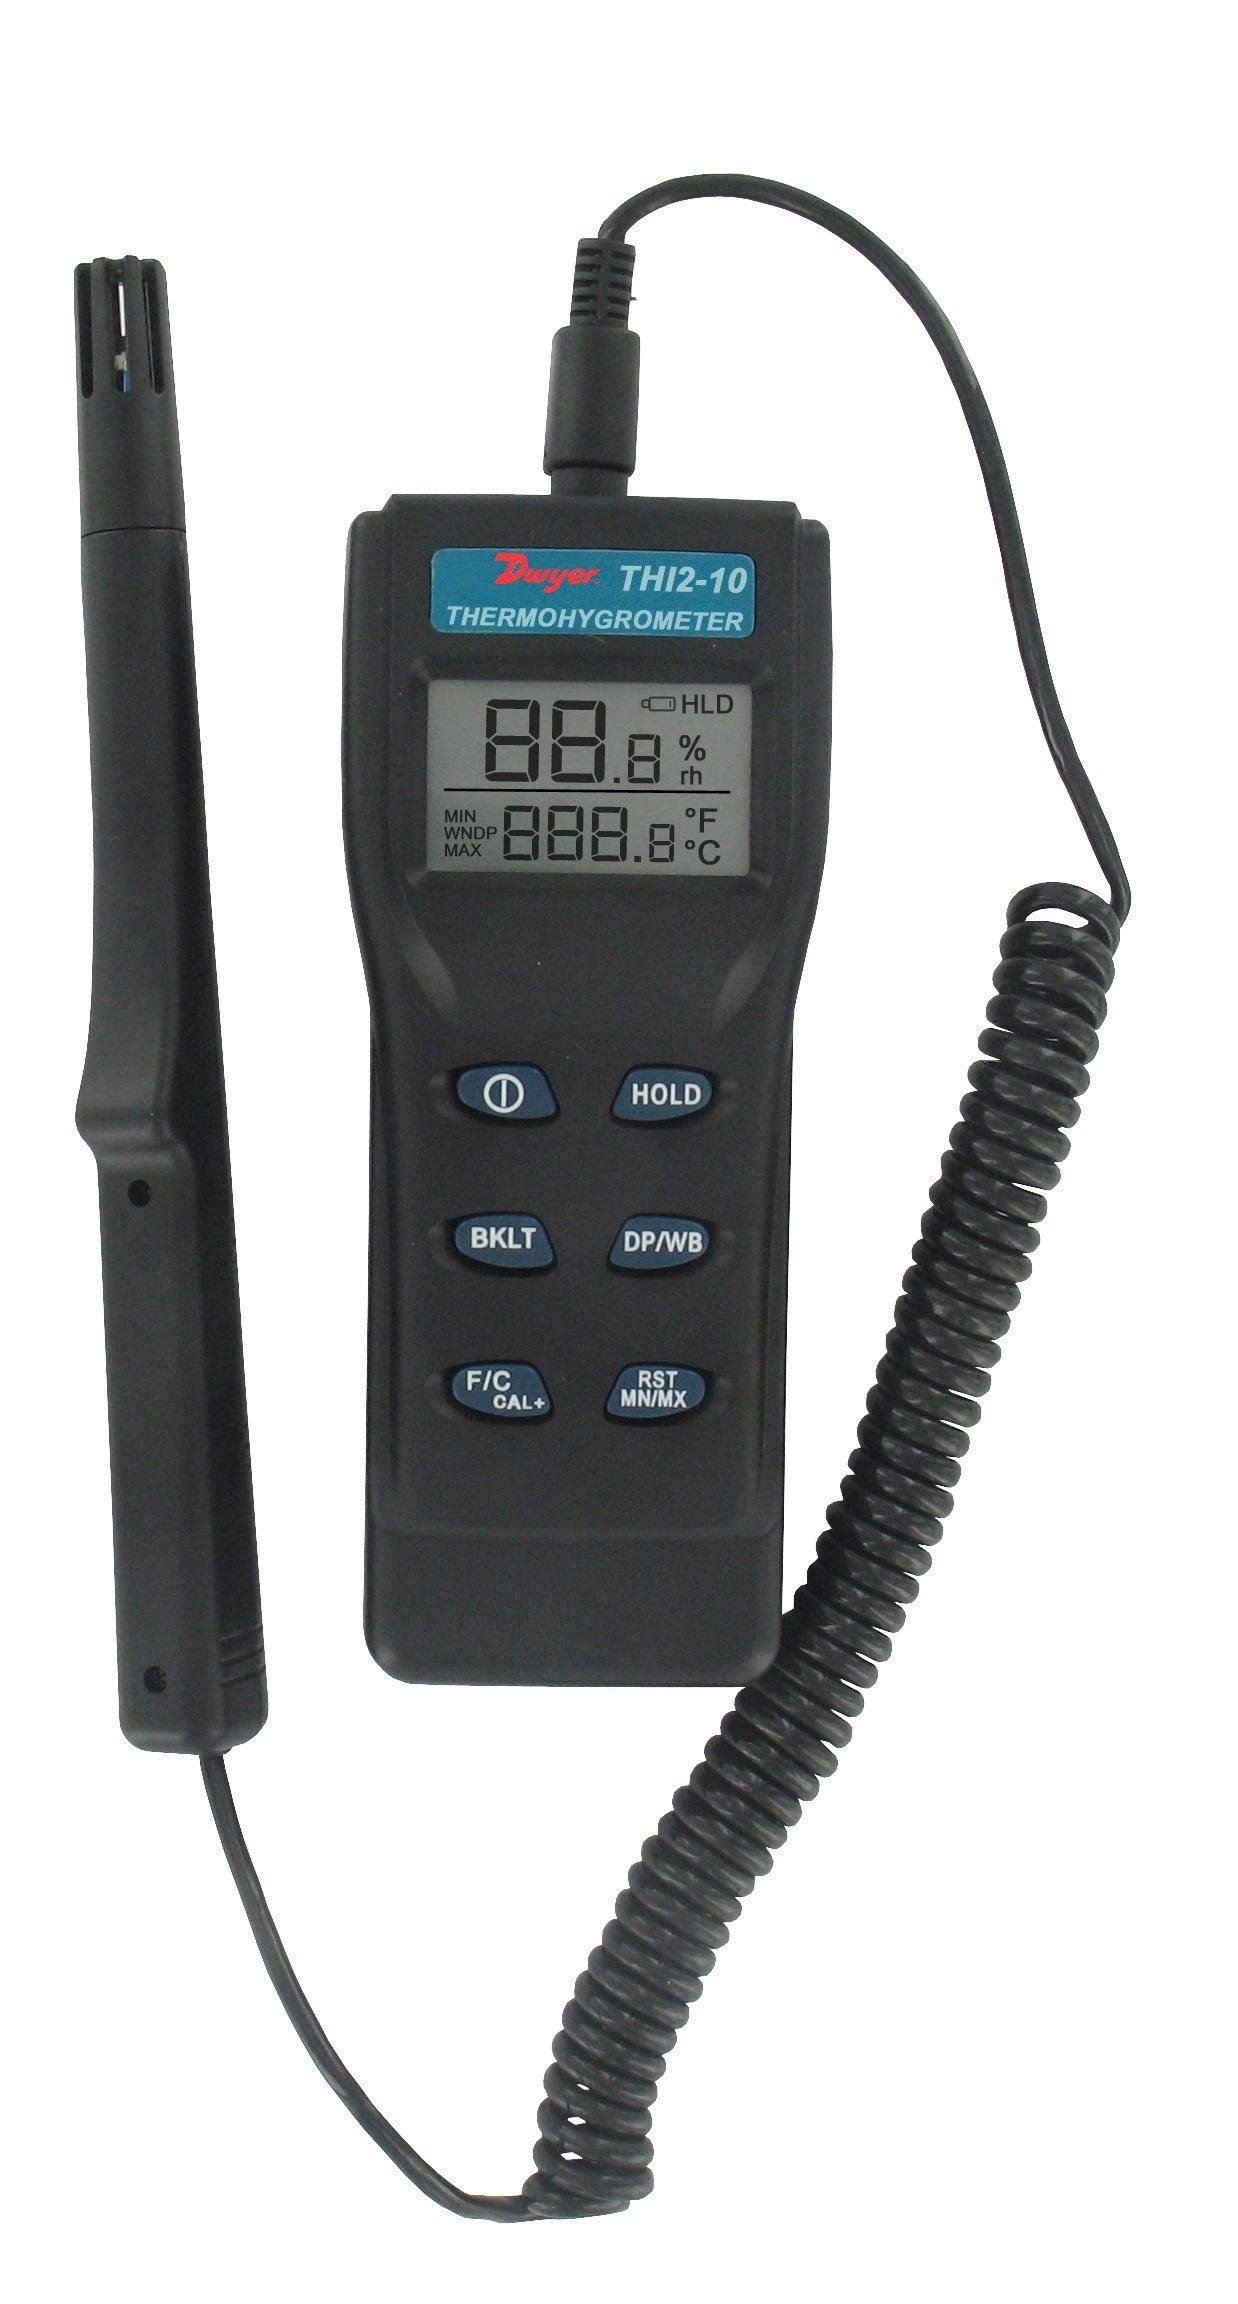 Dwyer Digital Thermo-Hygrometer, THI2-10, w/ Remote Probe